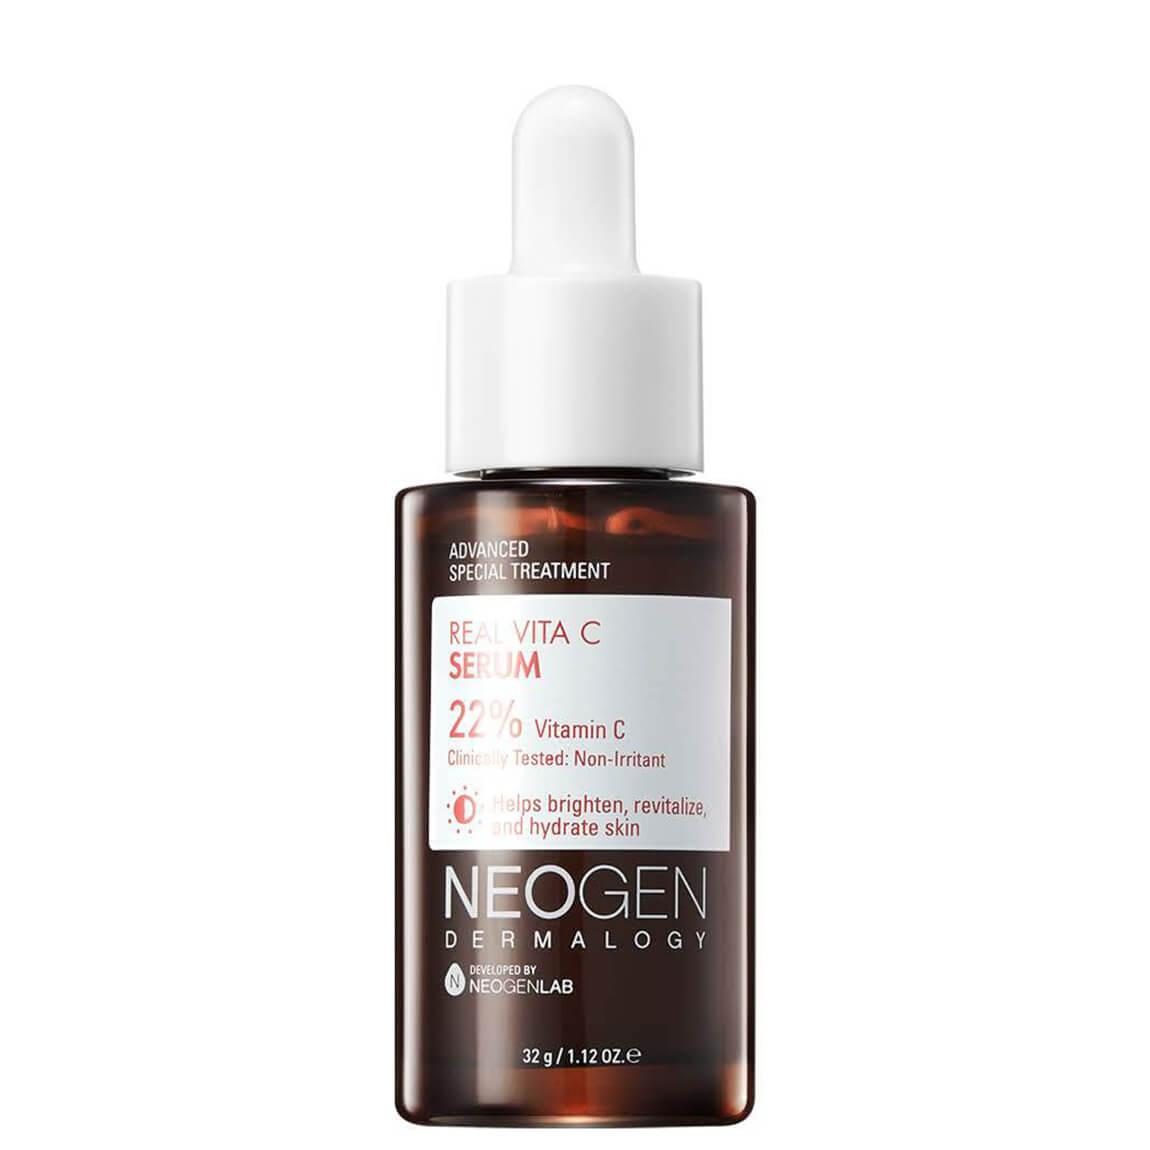 Neogen Real Vita C Serum - 22% Vitamin C 32ml